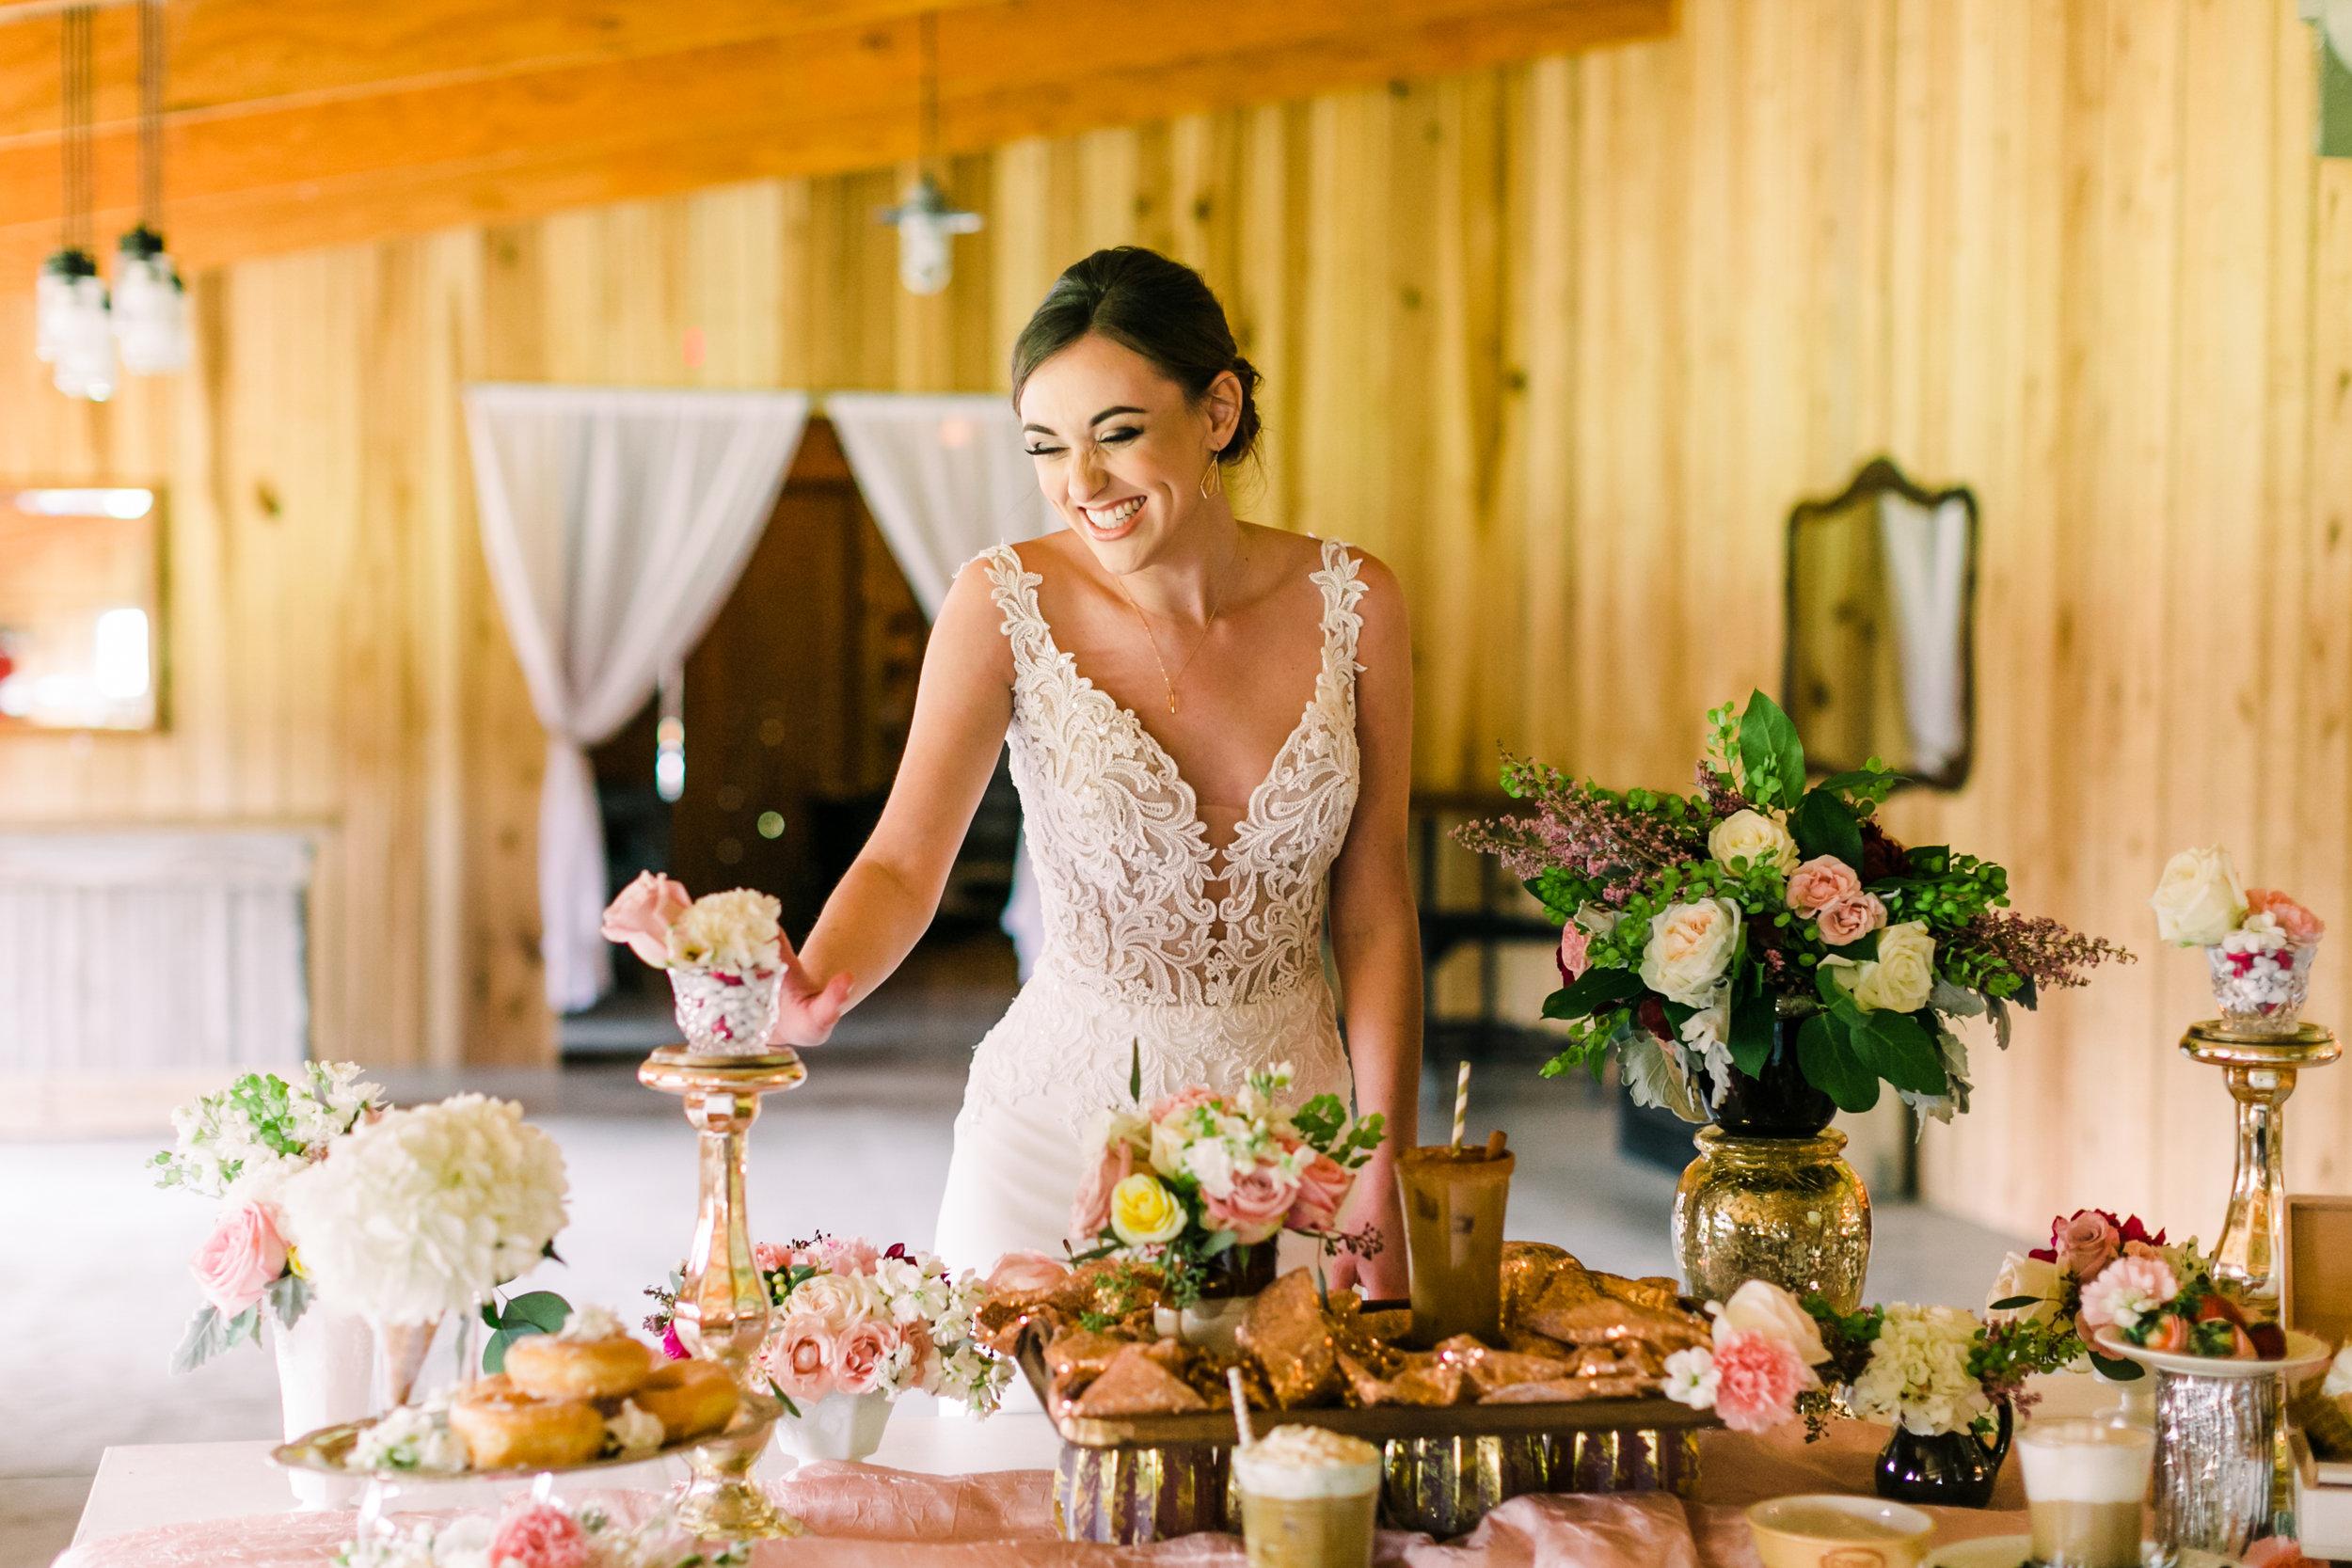 romantic+valentines+day+wedding+coffee (11 of 12).jpg